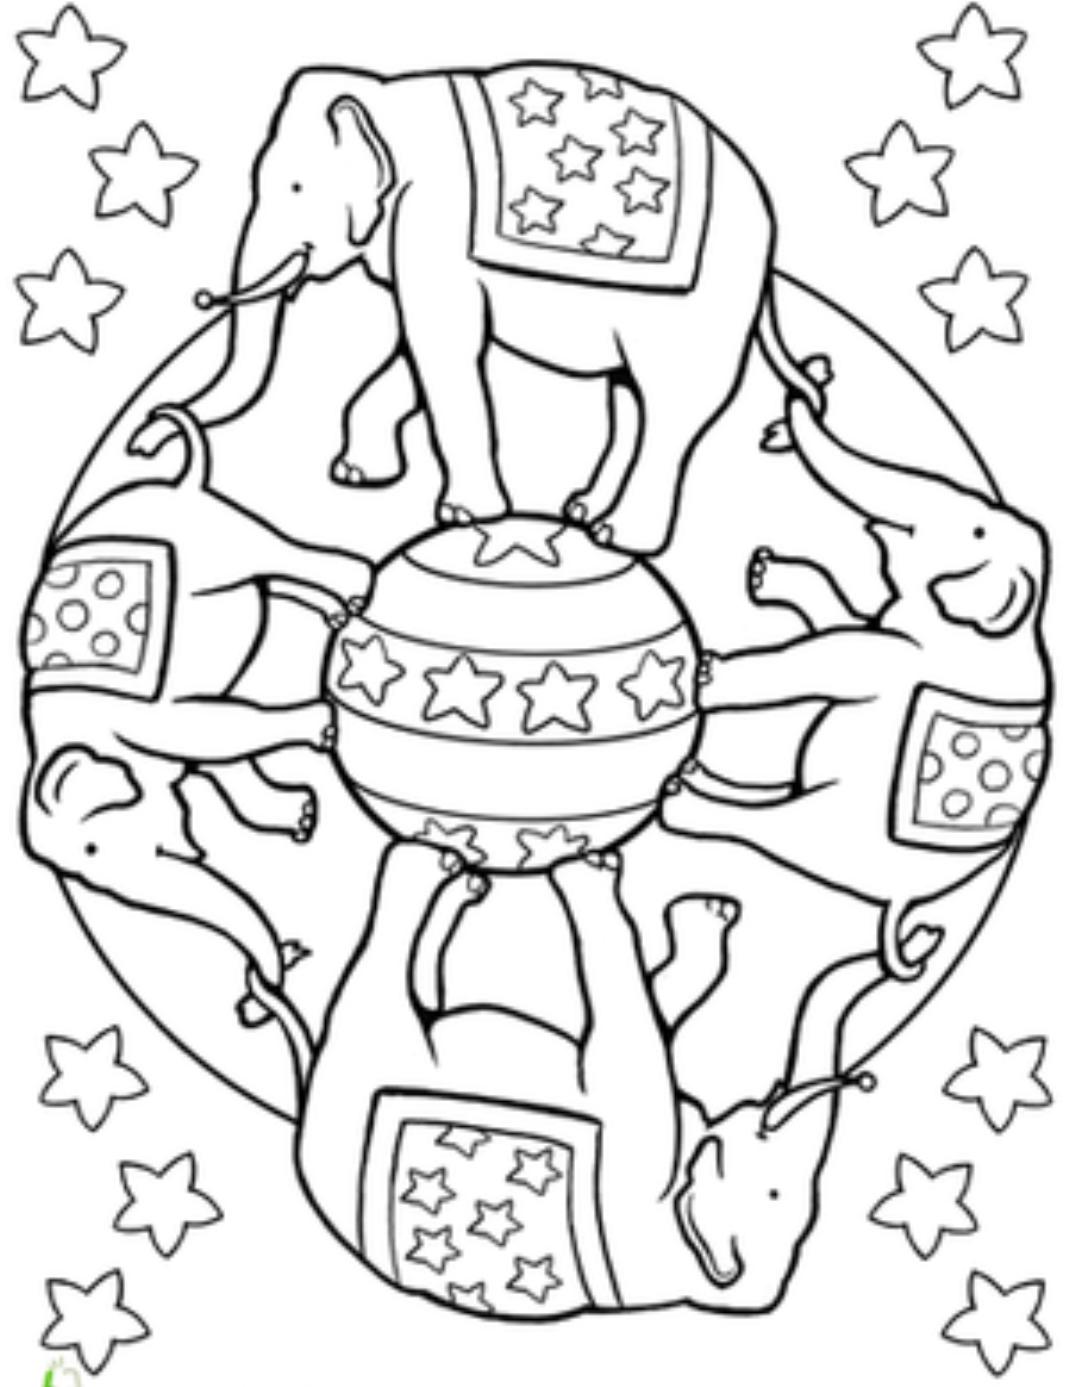 Circus Elephant Mandala Coloring Pages